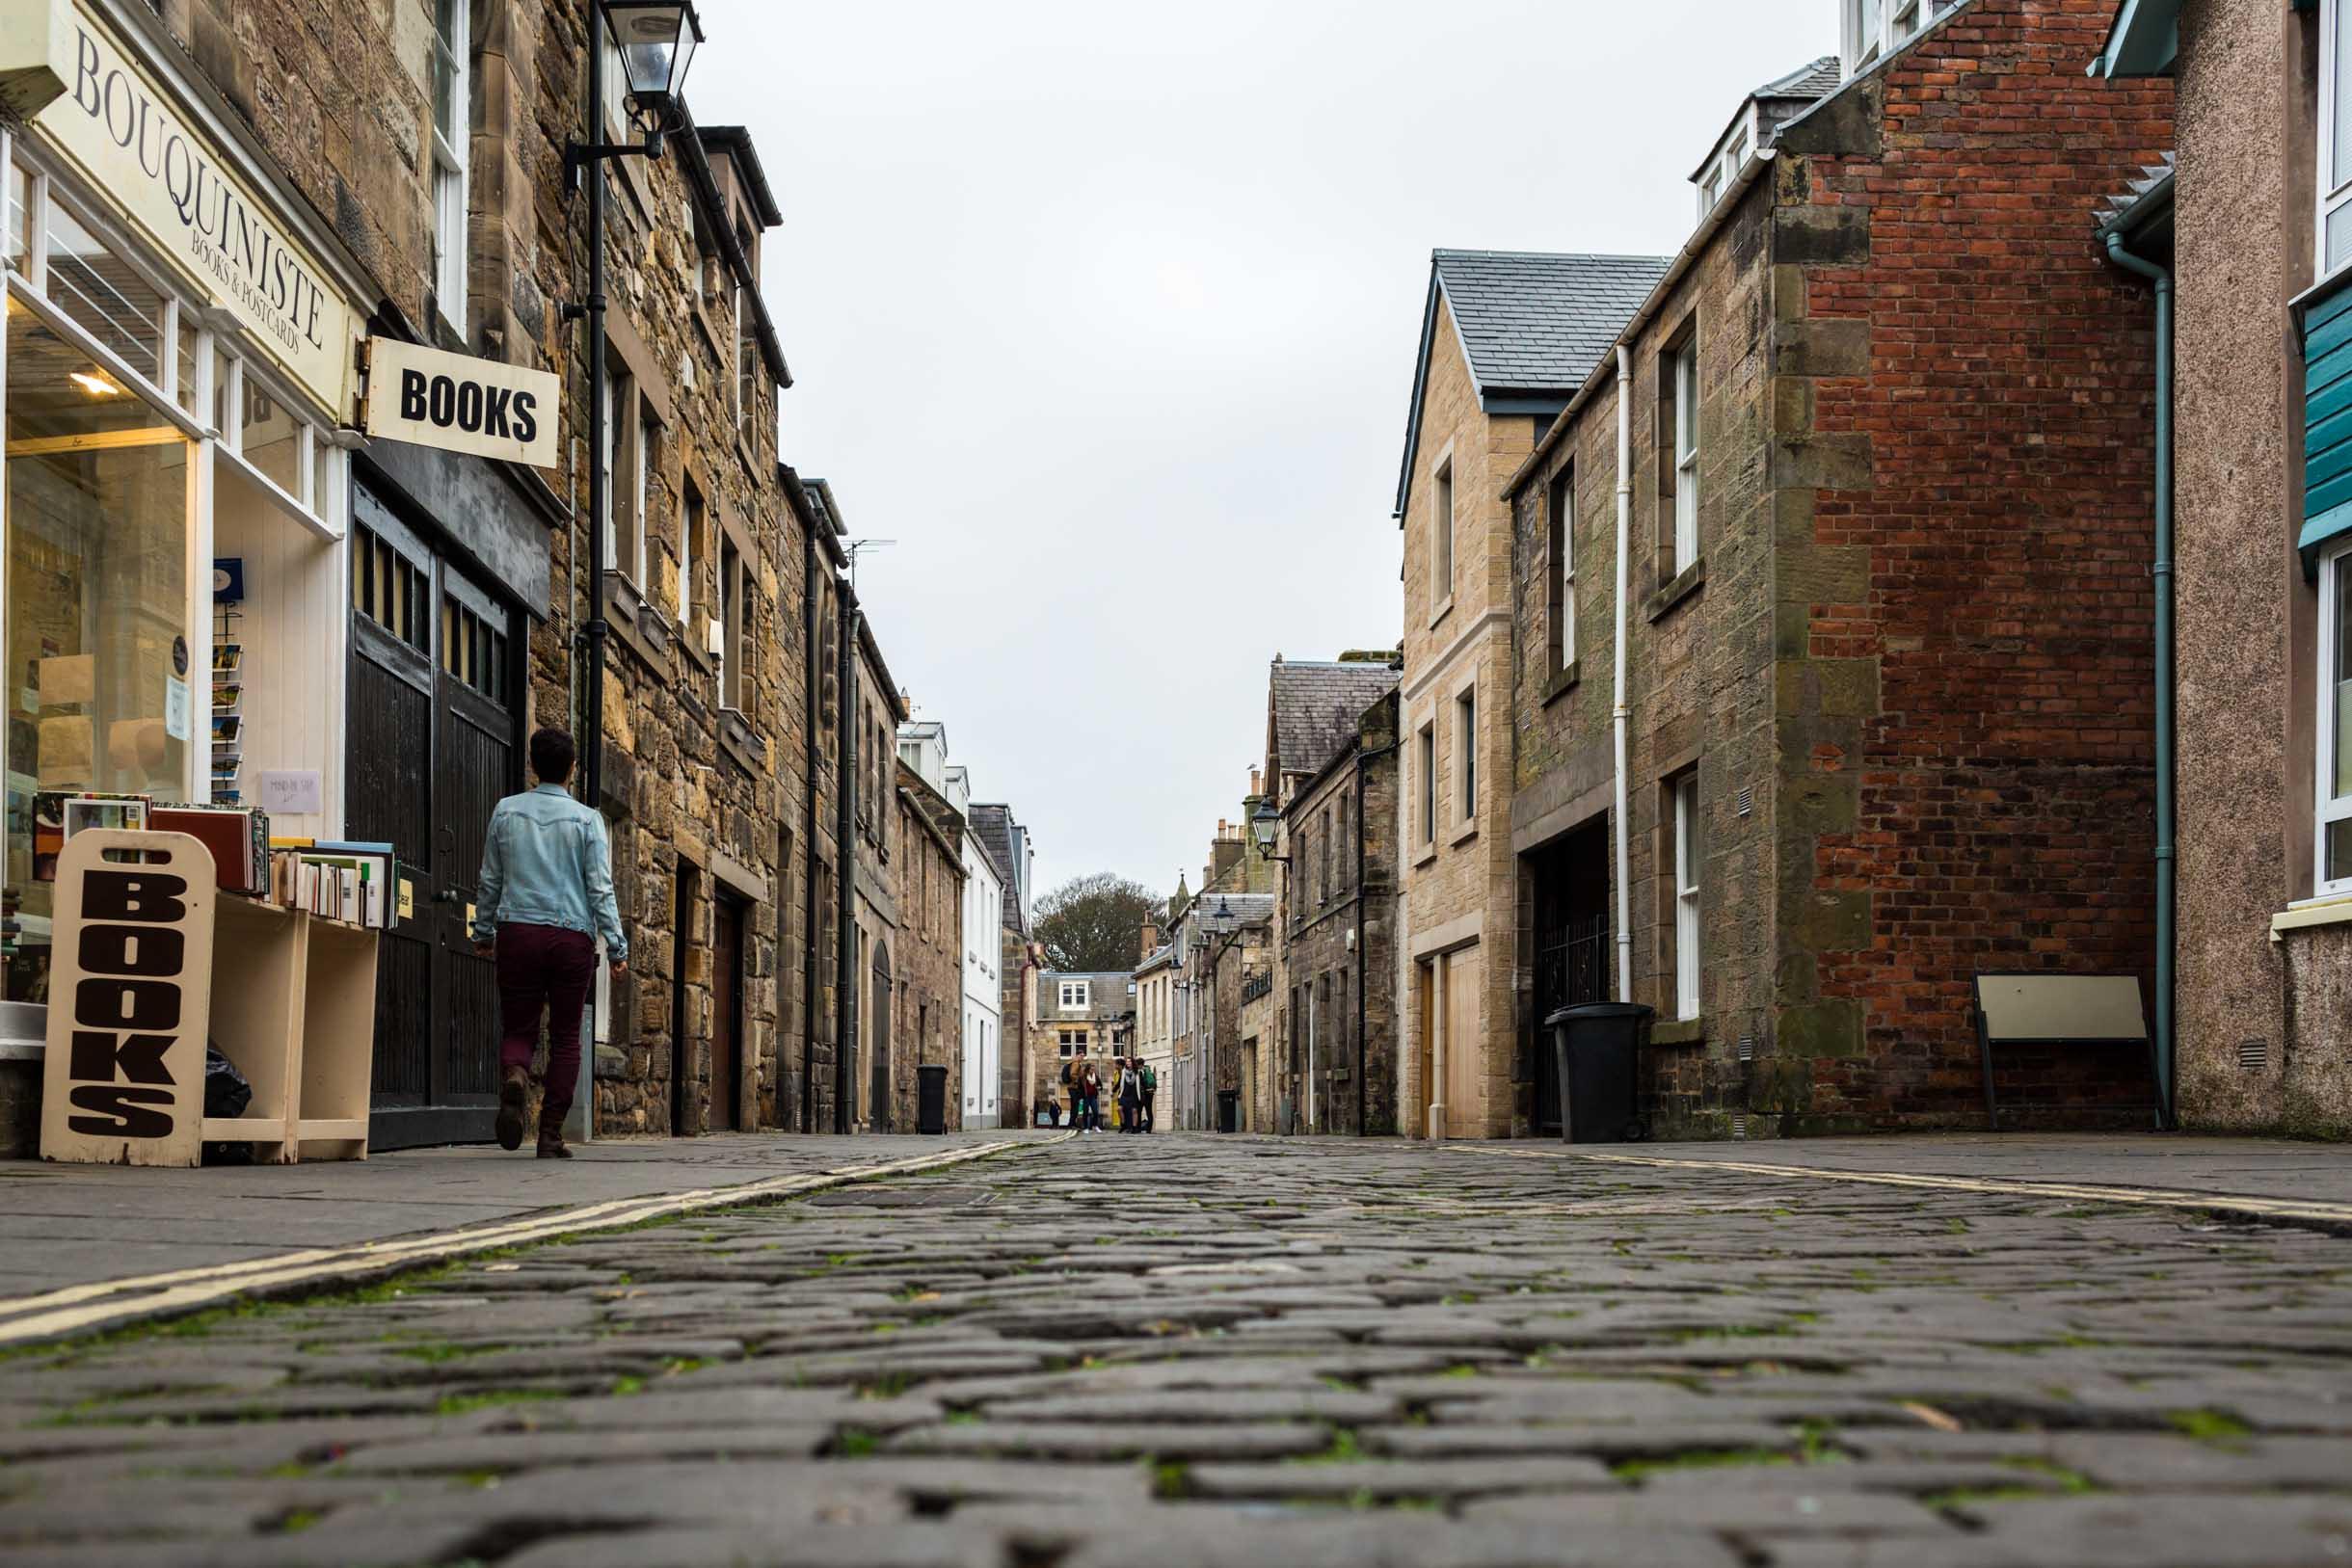 St. Andrews Scotland walking